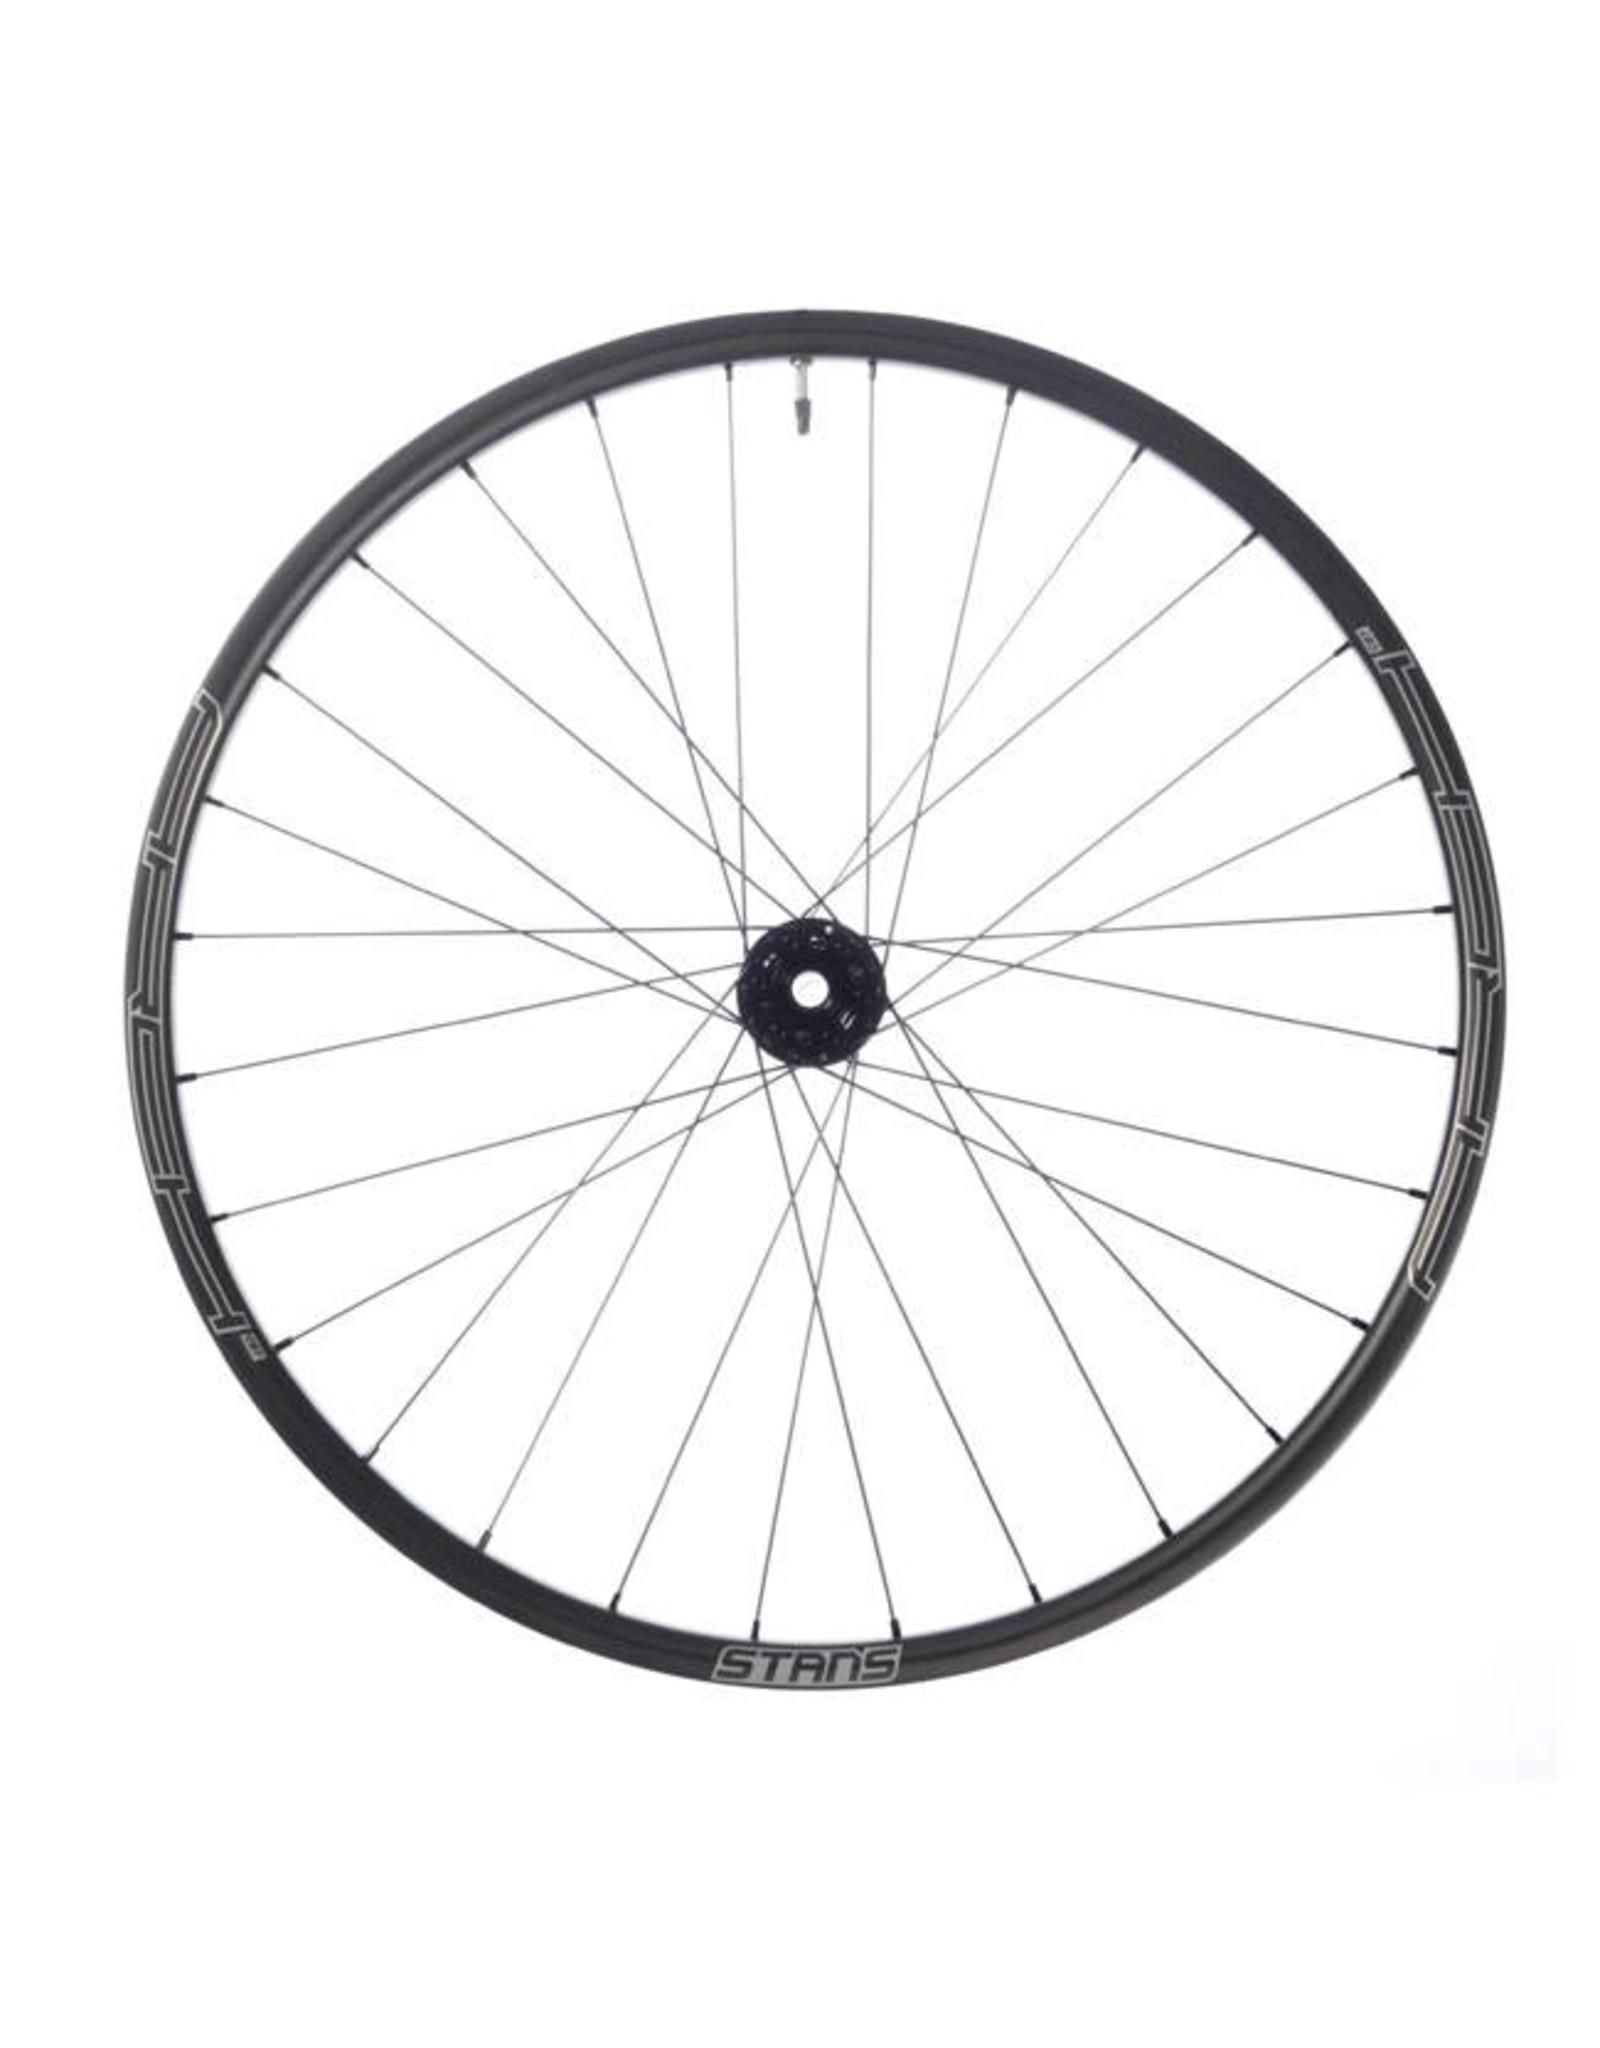 "Stan's No Tubes Stan's No Tubes Arch CB7 Rear Wheel: 27.5"" Carbon, 12 x 142mm, 6-Bolt Disc, SRAM XD, Black"